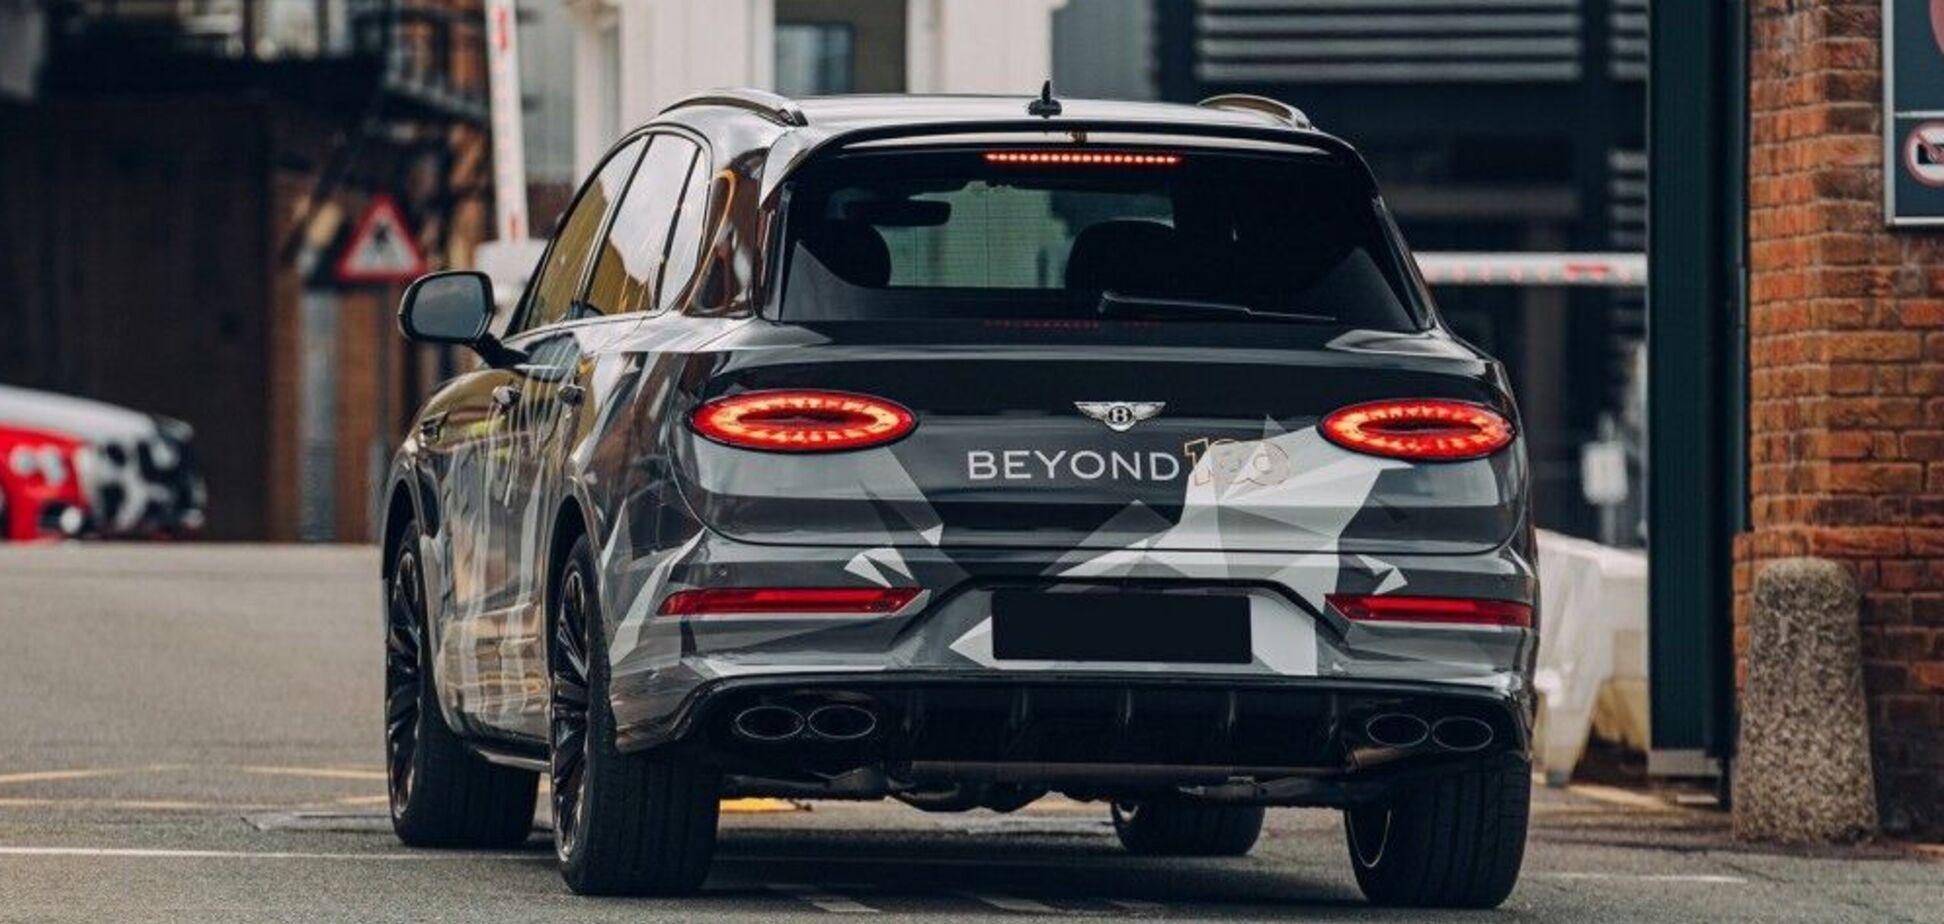 Bentley Bentayga Speed скоро вирушить у продаж. Фото: firstgear.ua